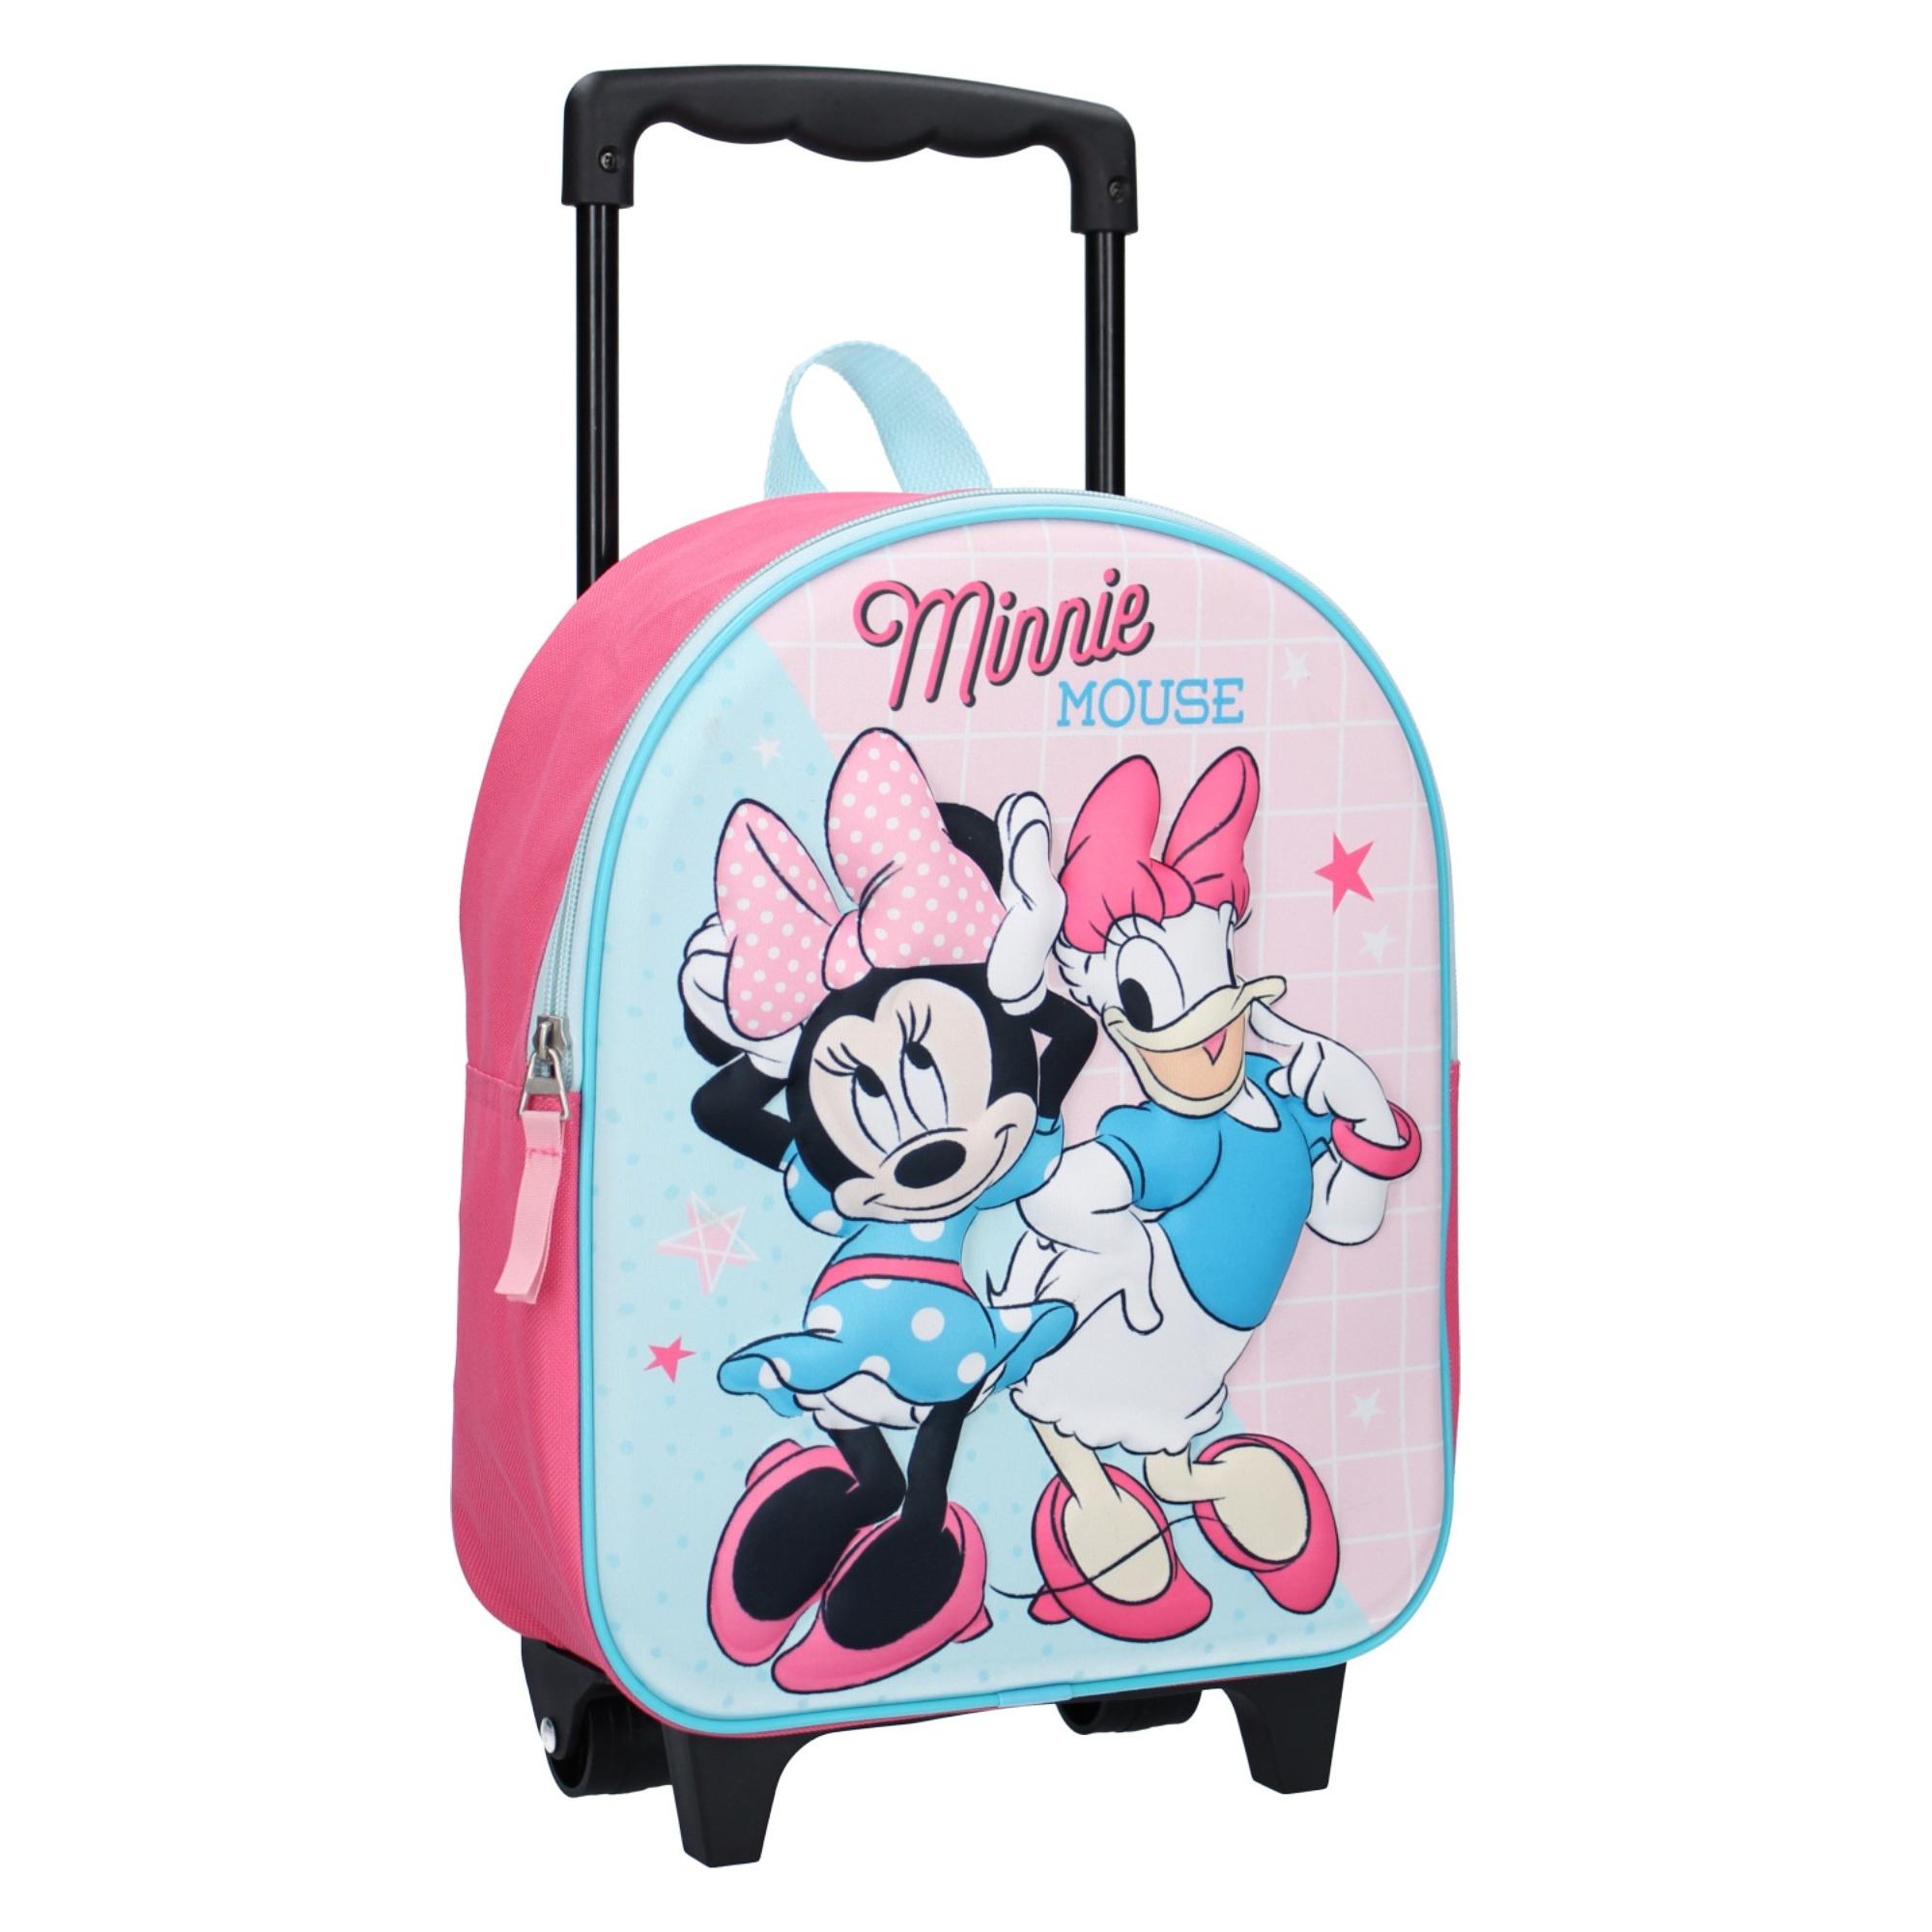 Minnie Mouse handbagage reiskoffer-trolley 31 cm voor kinderen